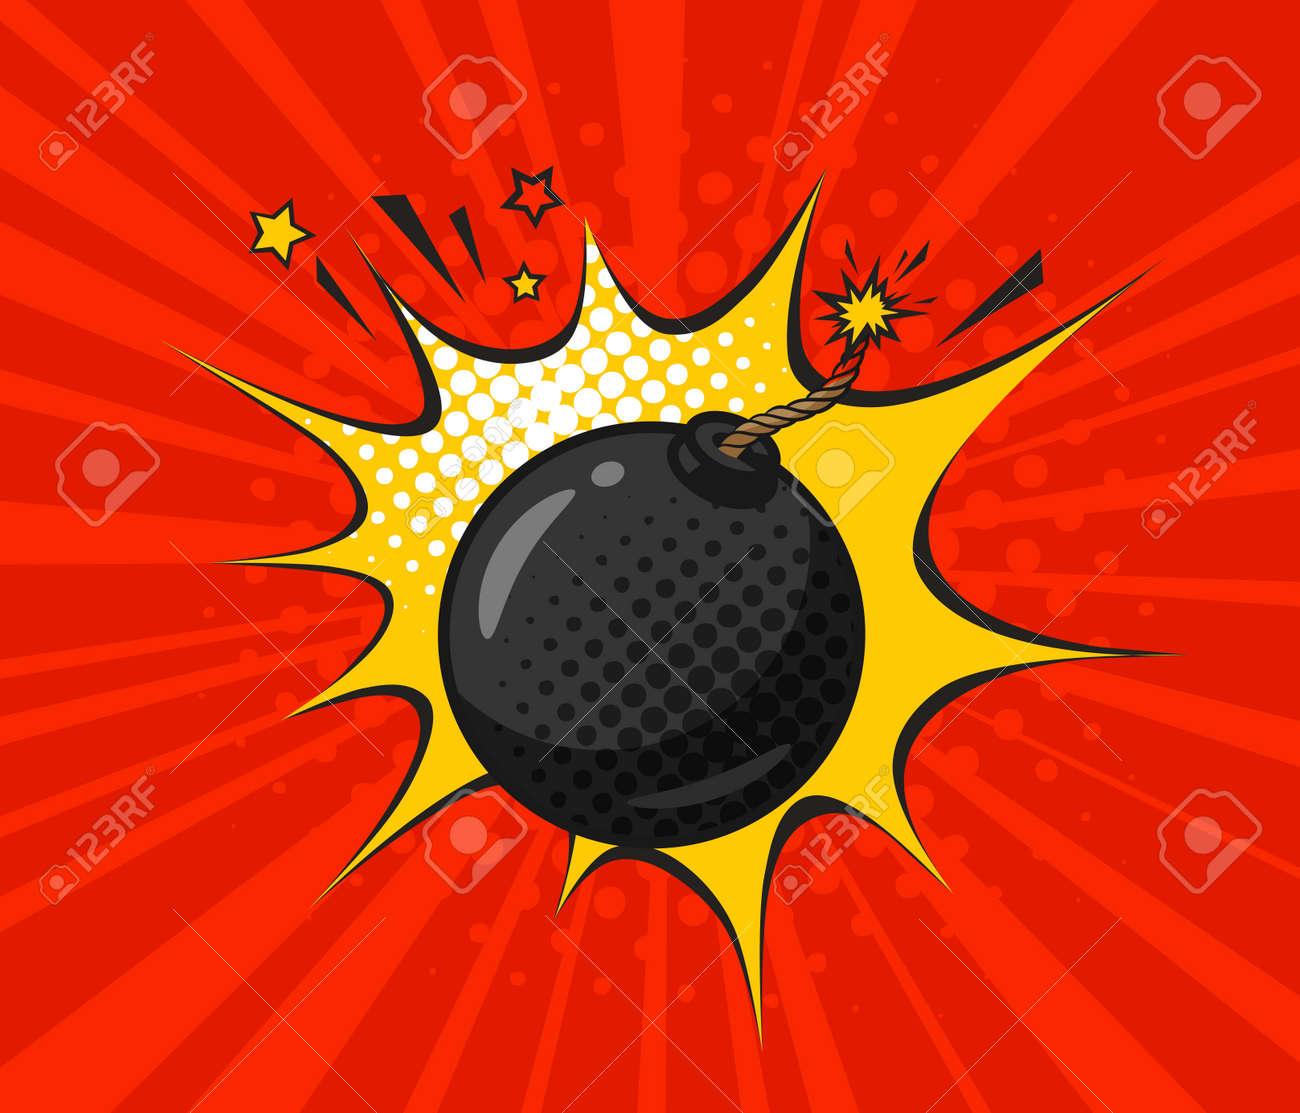 Round black bomb with burning fuse, drawn in retro pop art style. Cartoon comic vector illustration - 94288108